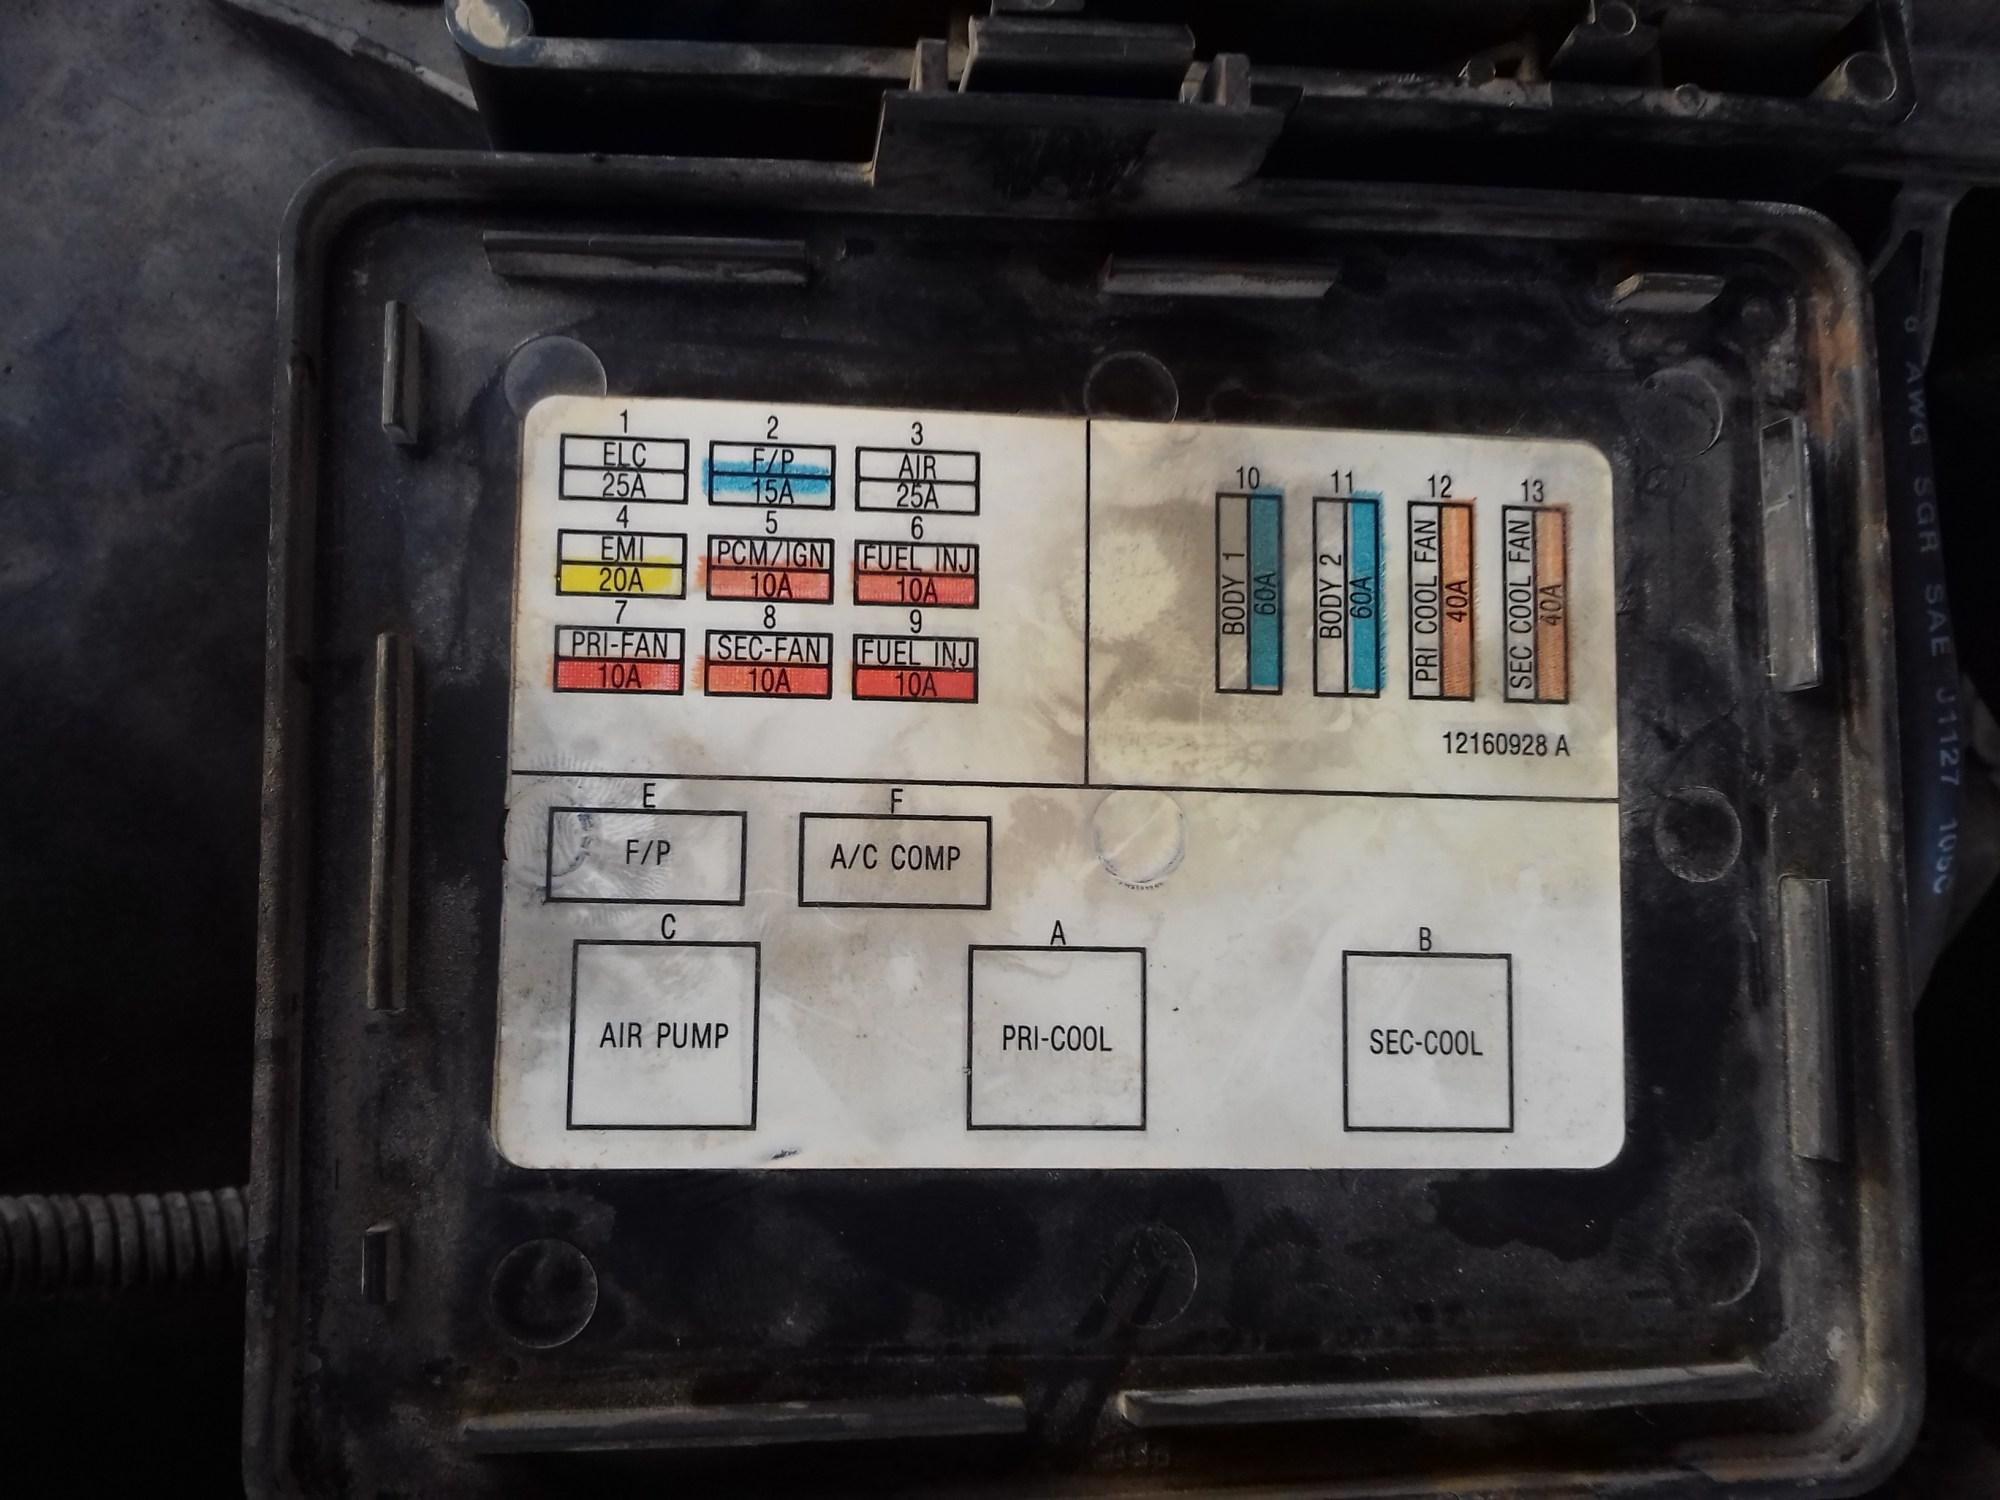 hight resolution of 1996 camaro fuse box diagram blog about wiring diagrams 88 camaro fuse box 94 camaro fuse